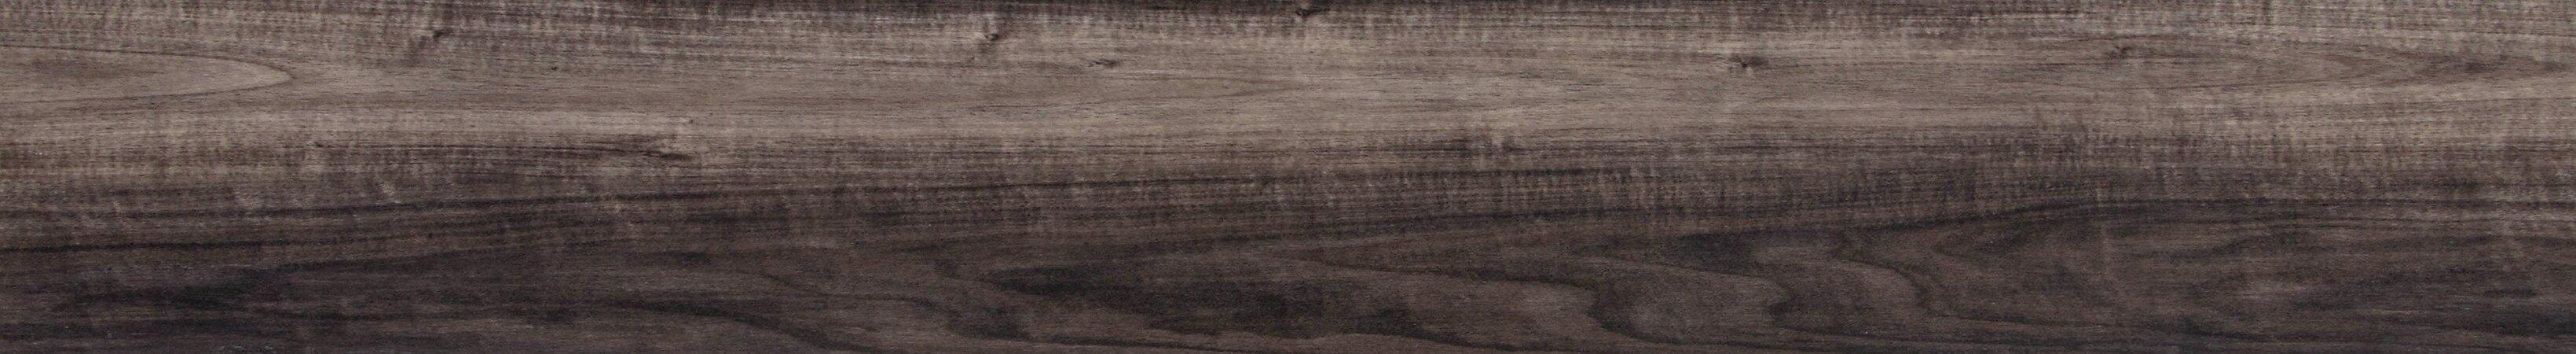 EarthWerks Parkhill 7 X 48 6mm Luxury Vinyl Plank In Dark Gray